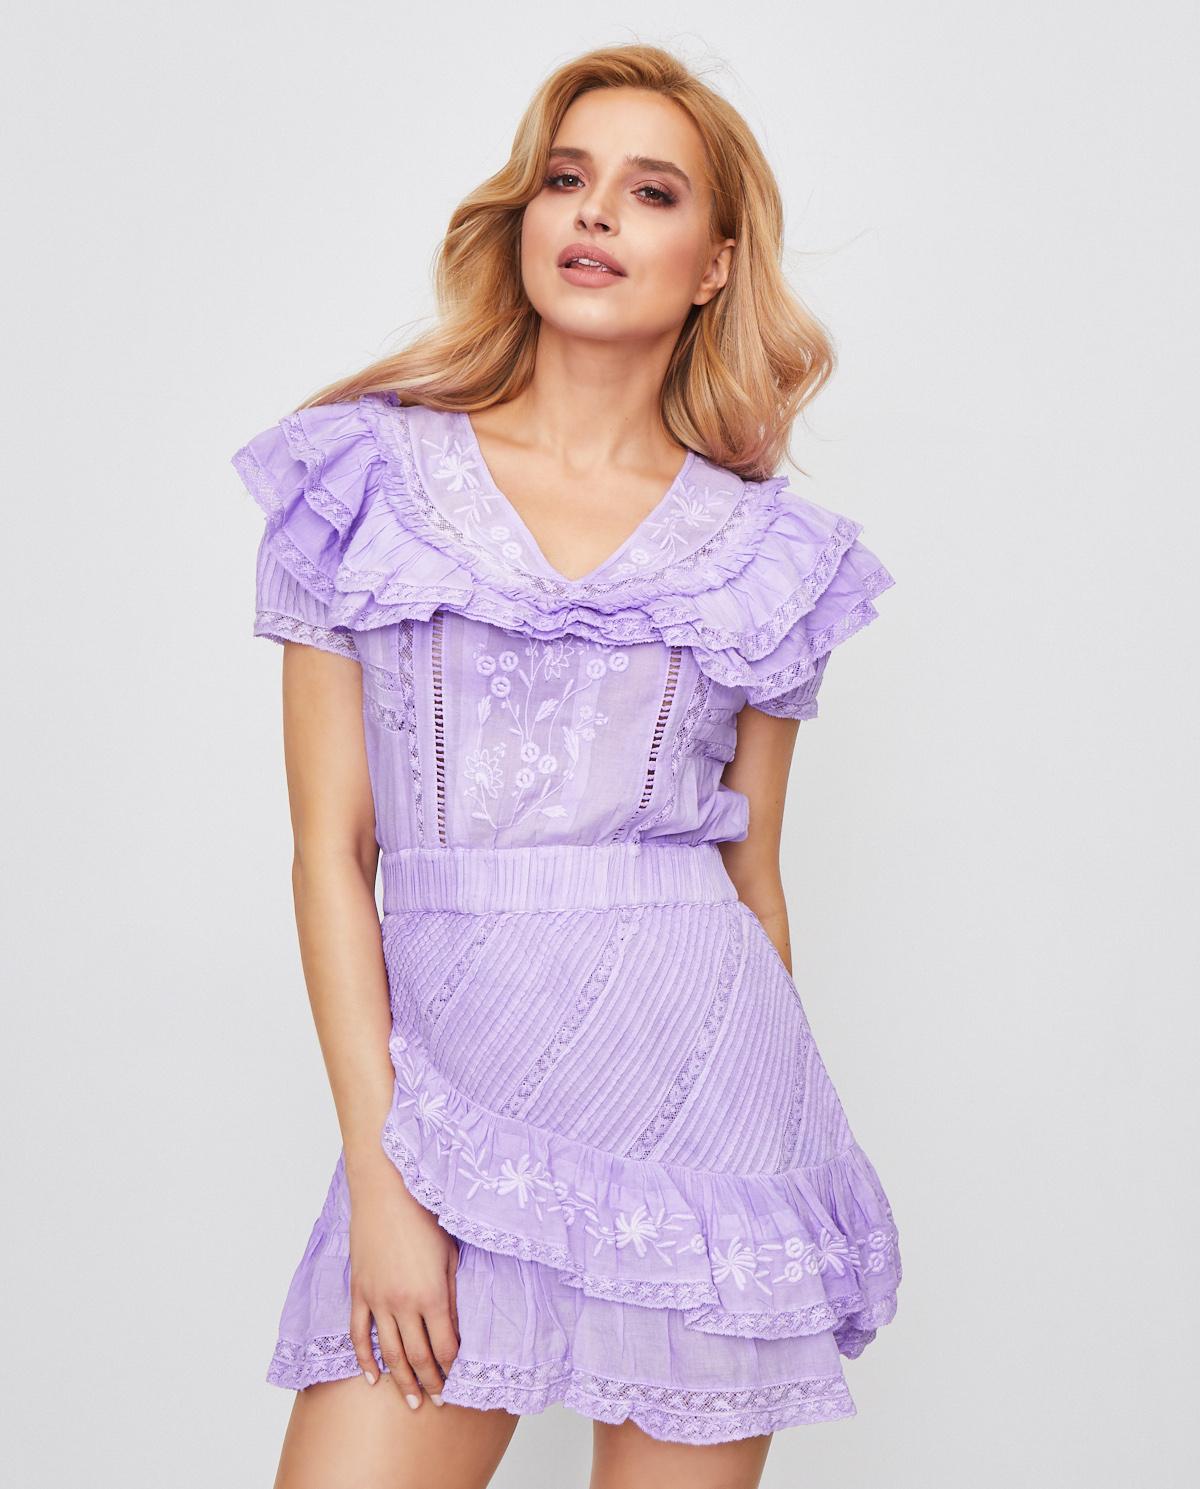 Lawendowa sukienka Bonita Love Shack Fancy LD624-493 LAVEN